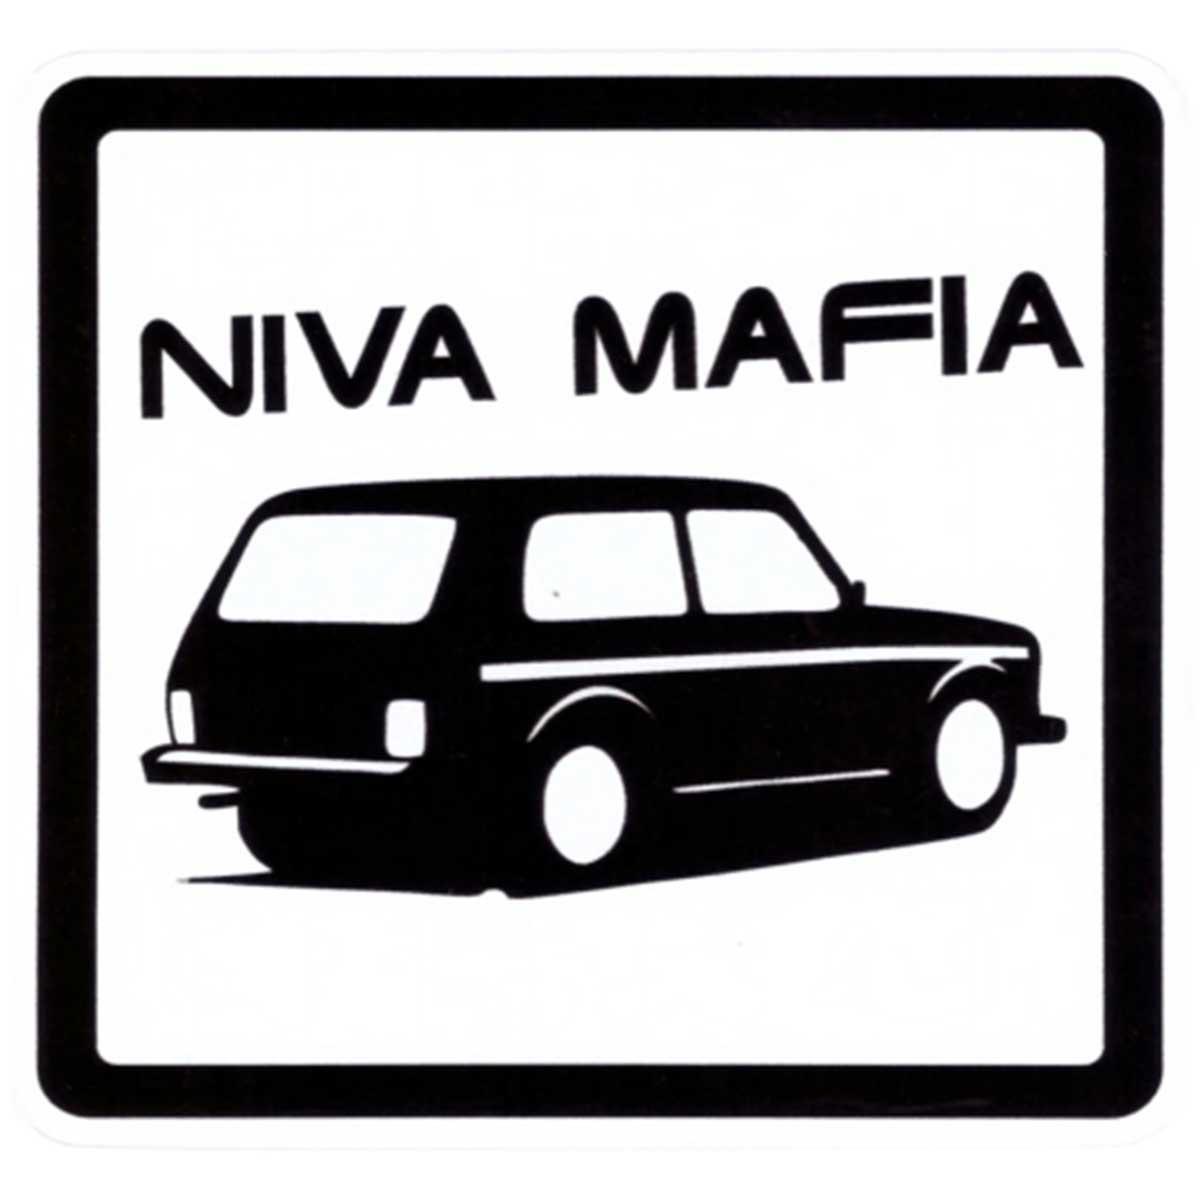 Фото - Наклейка на автомобиль Niva Mafia виниловая 15х15 наклейка инвалид в авто двухсторонняя 15х15 см